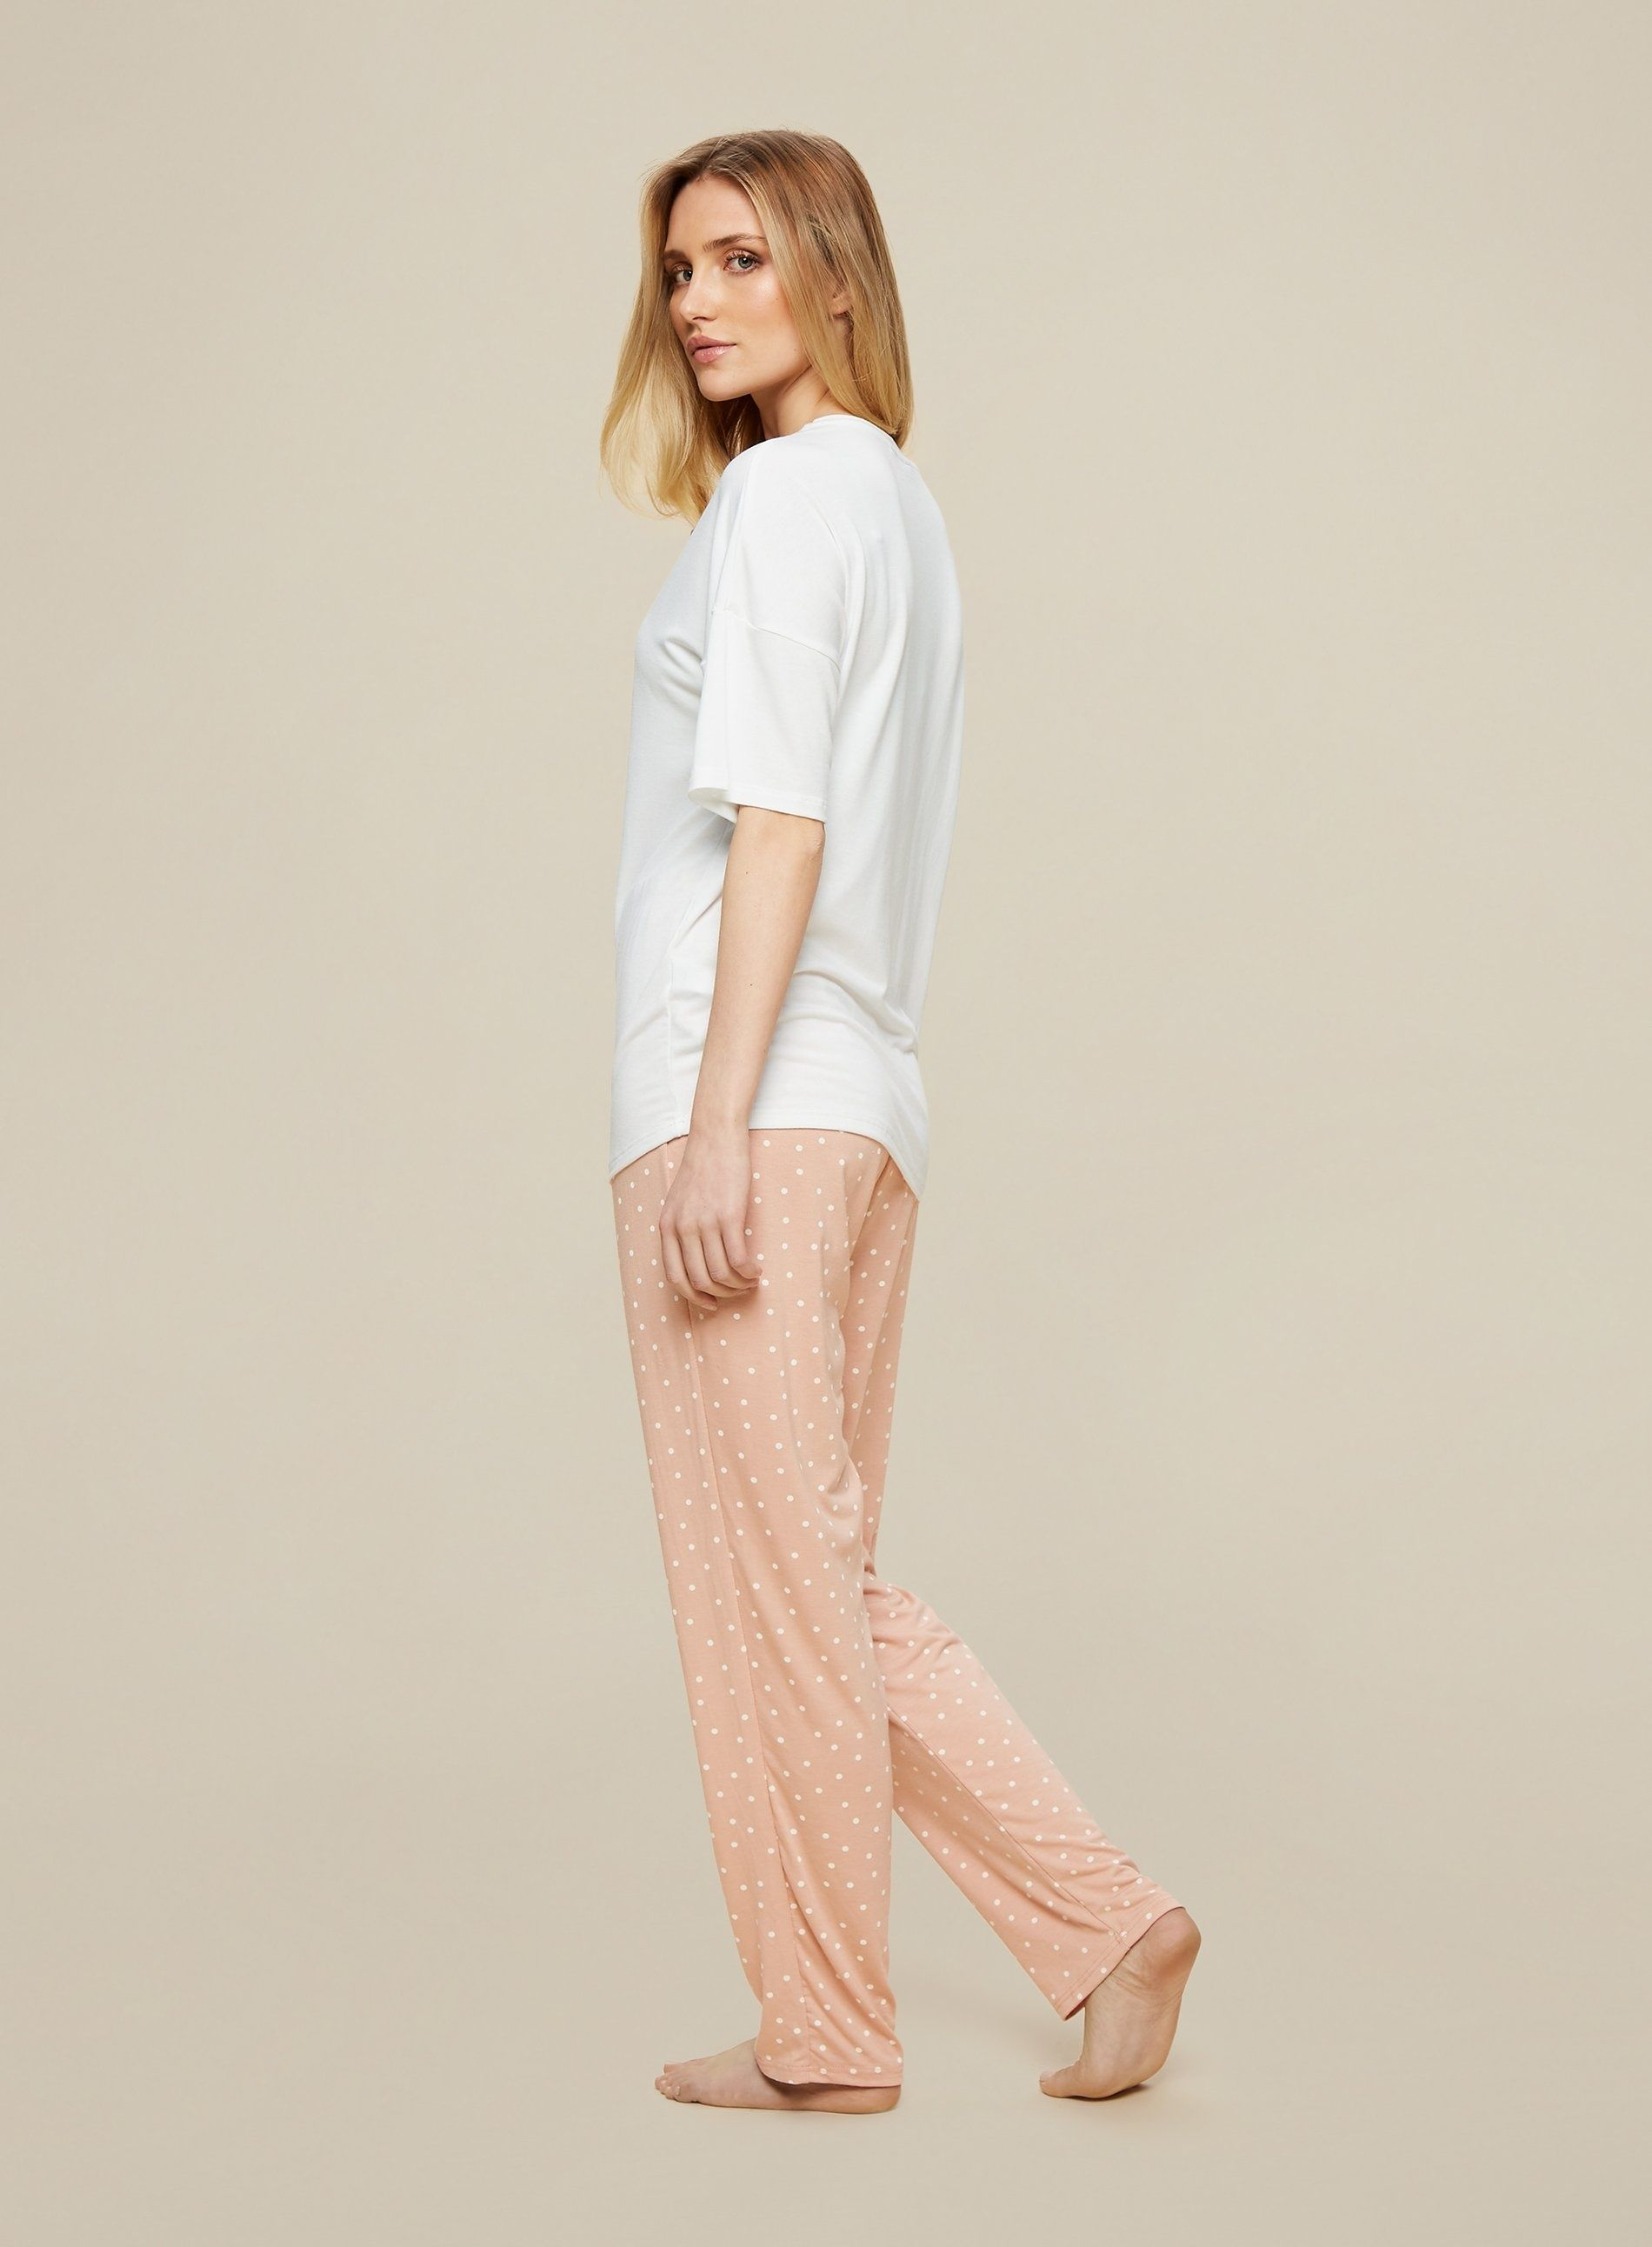 Dorothy Perkins Womens Blush Love Twosie Pyjama Set Lounge Nightwear Sleepwear